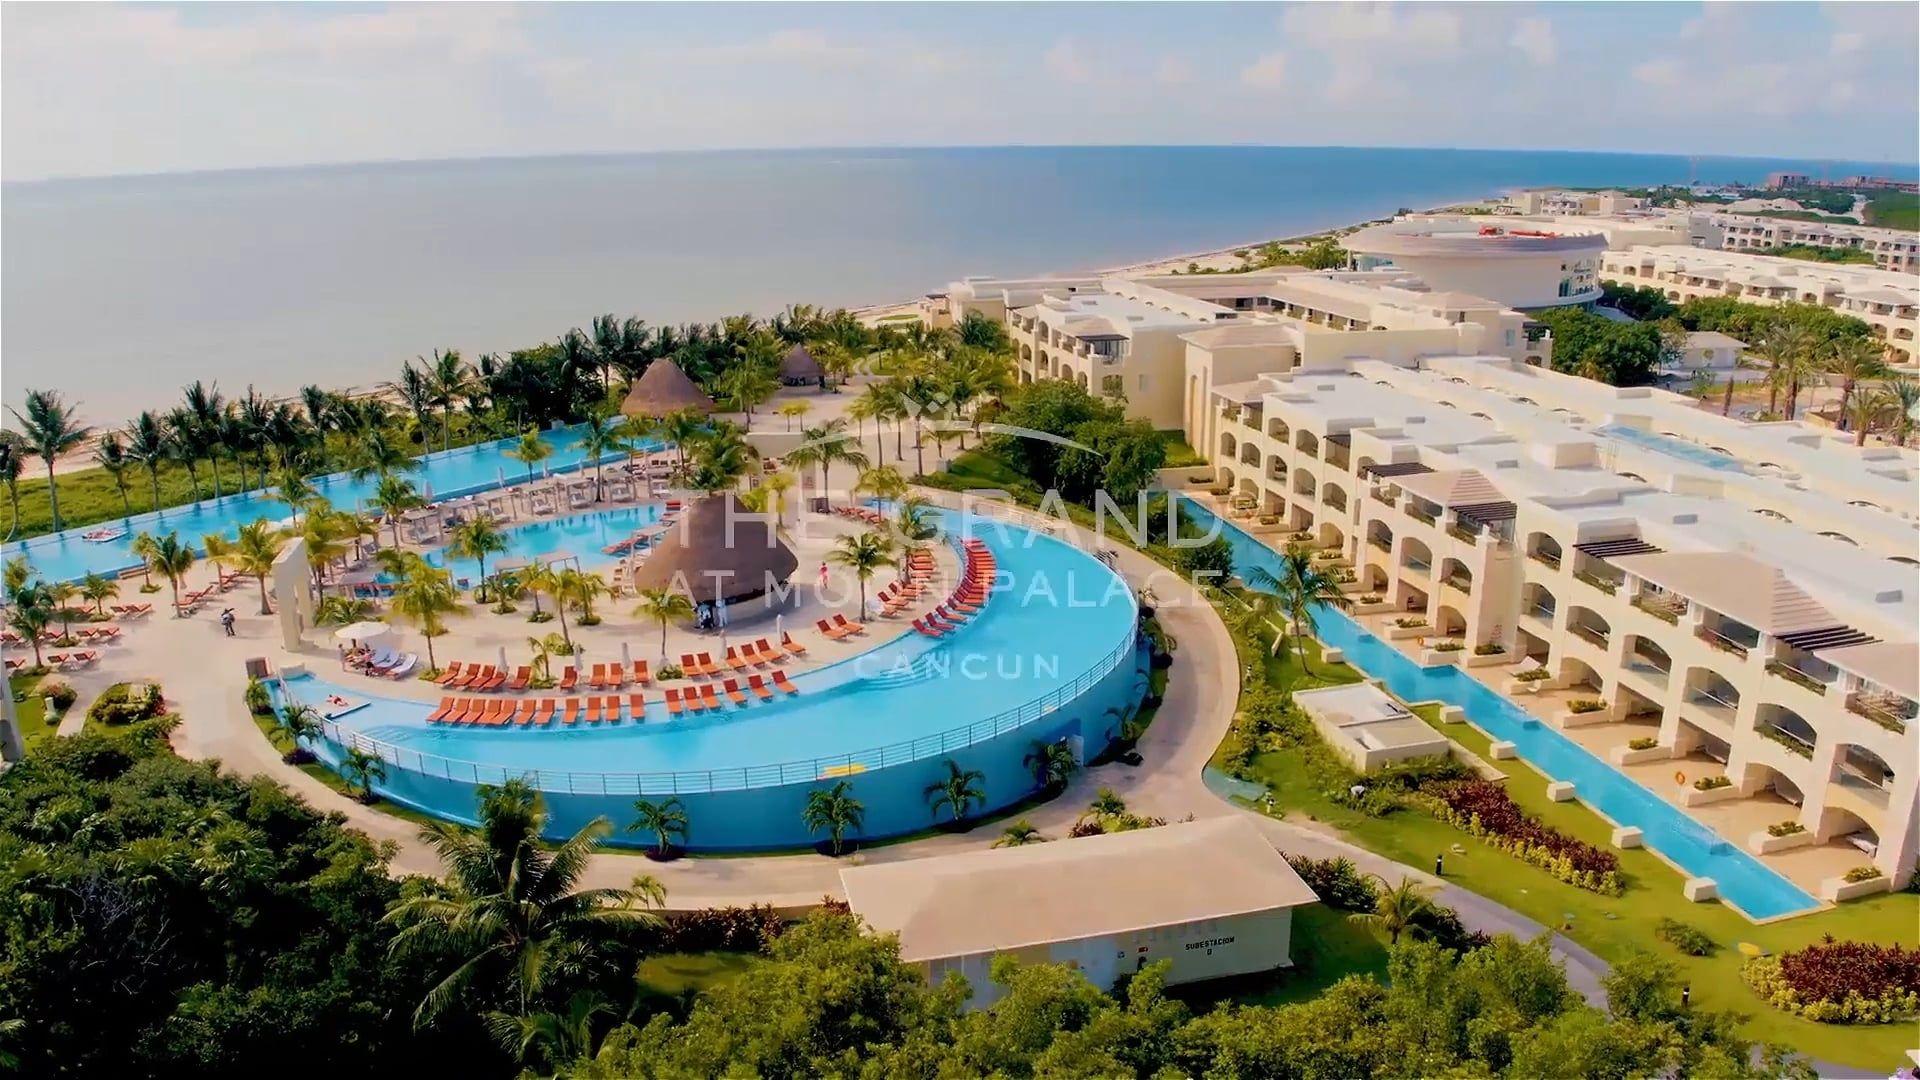 The Grand At Moon Palace Cancun 1 On Tripadvisor Moon Palace Cancun Moon Palace Resort Moon Palace